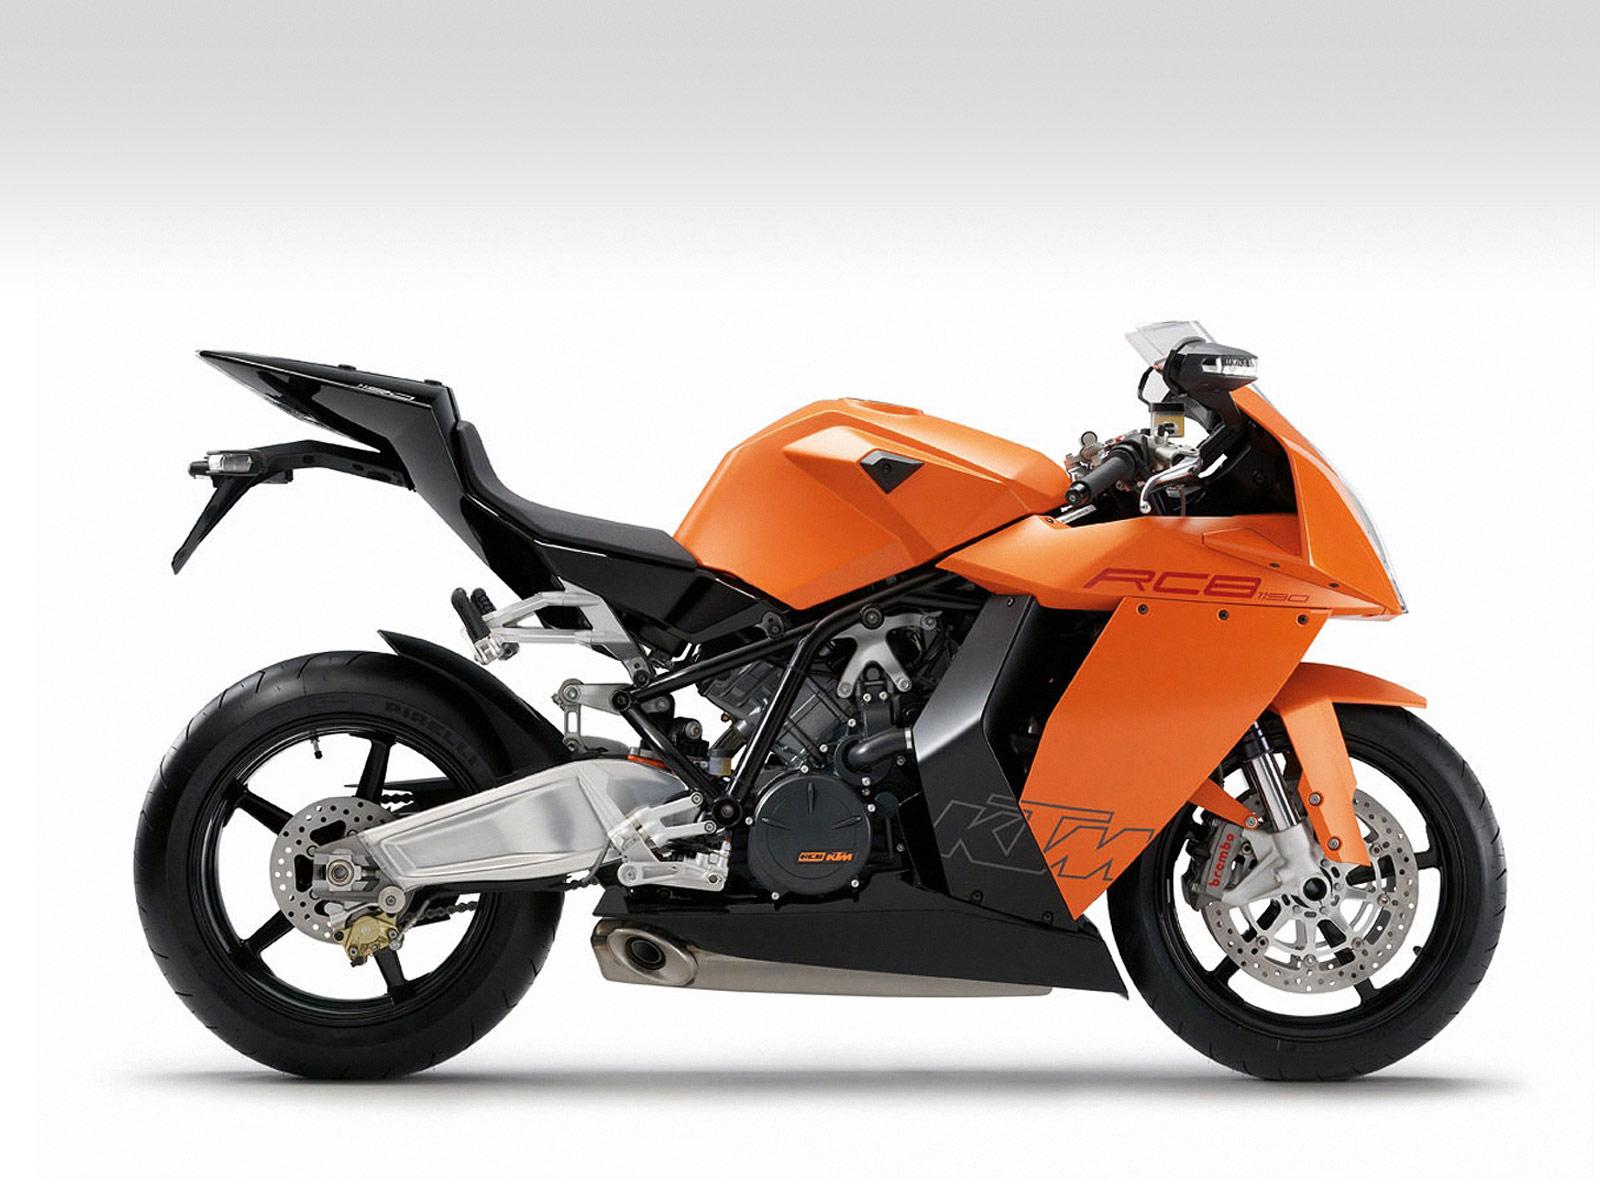 http://4.bp.blogspot.com/-OQQm8g_beY4/Tn0u1s3E_6I/AAAAAAAABRk/_QskxbRJ9LU/s1600/2010-KTM-1190RC8_motorcycle-desktop-wallpaper_2.jpg